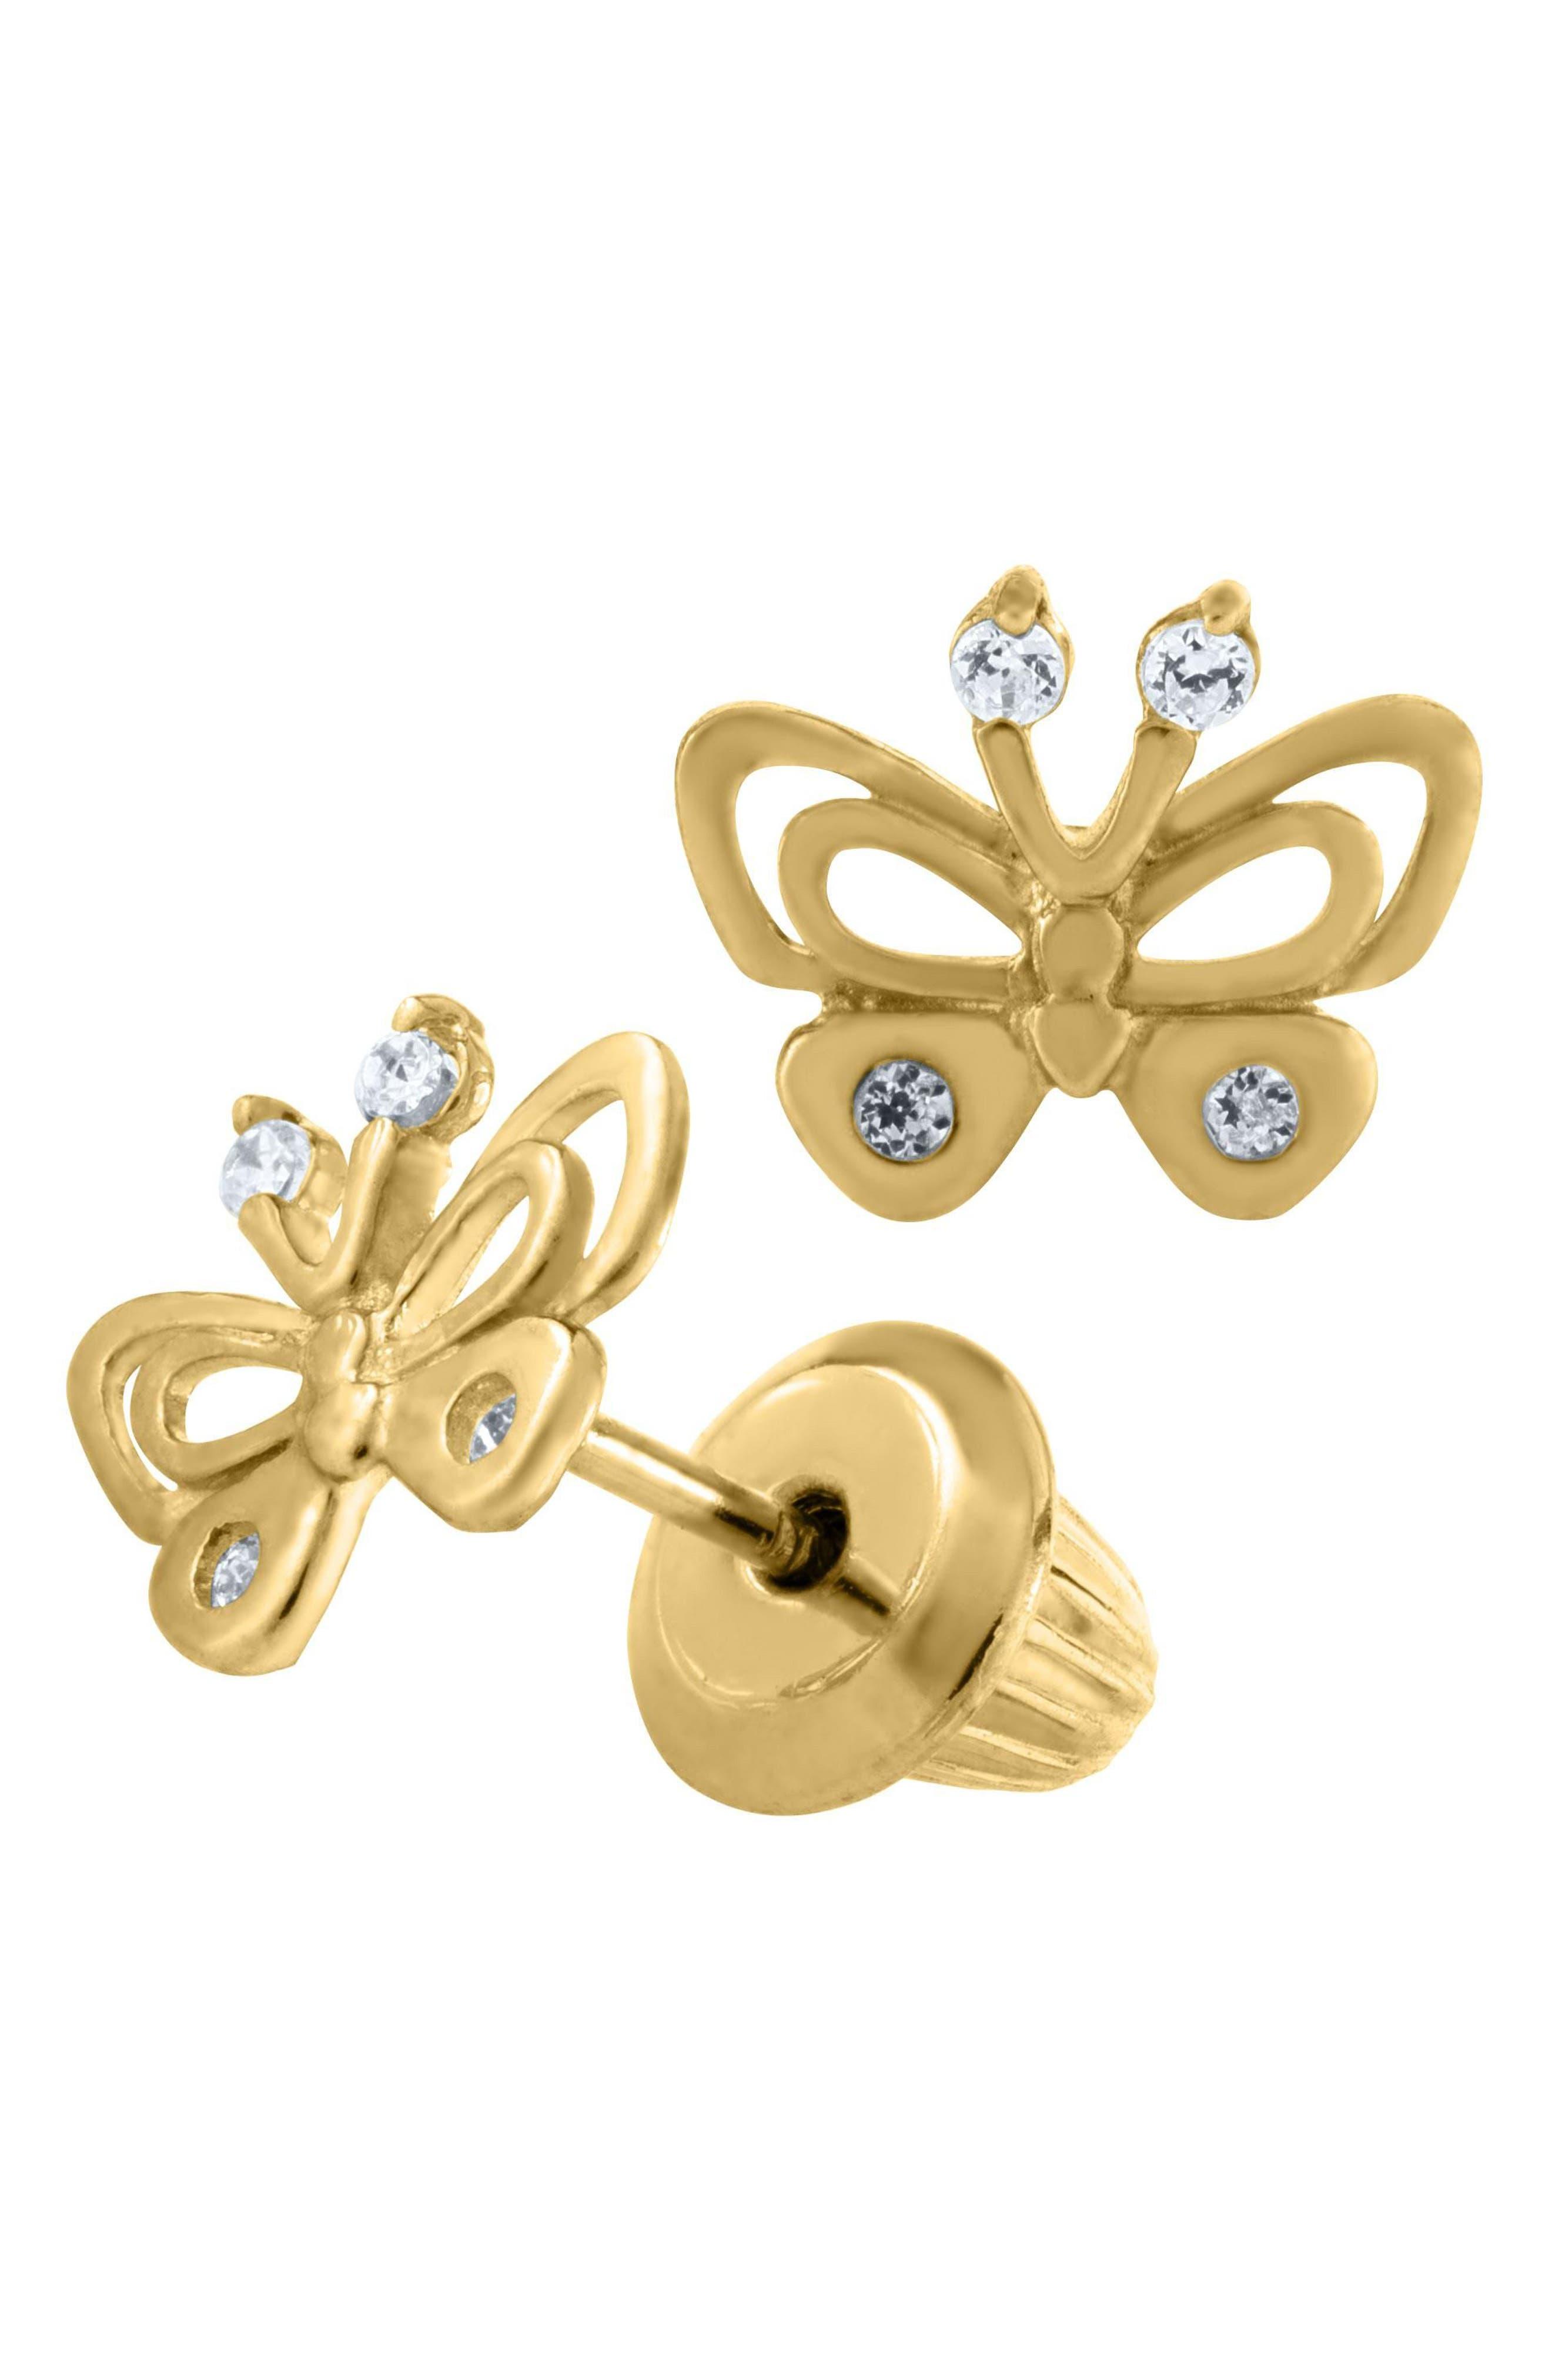 Girls Mignonette 14K Gold Butterfly Earrings